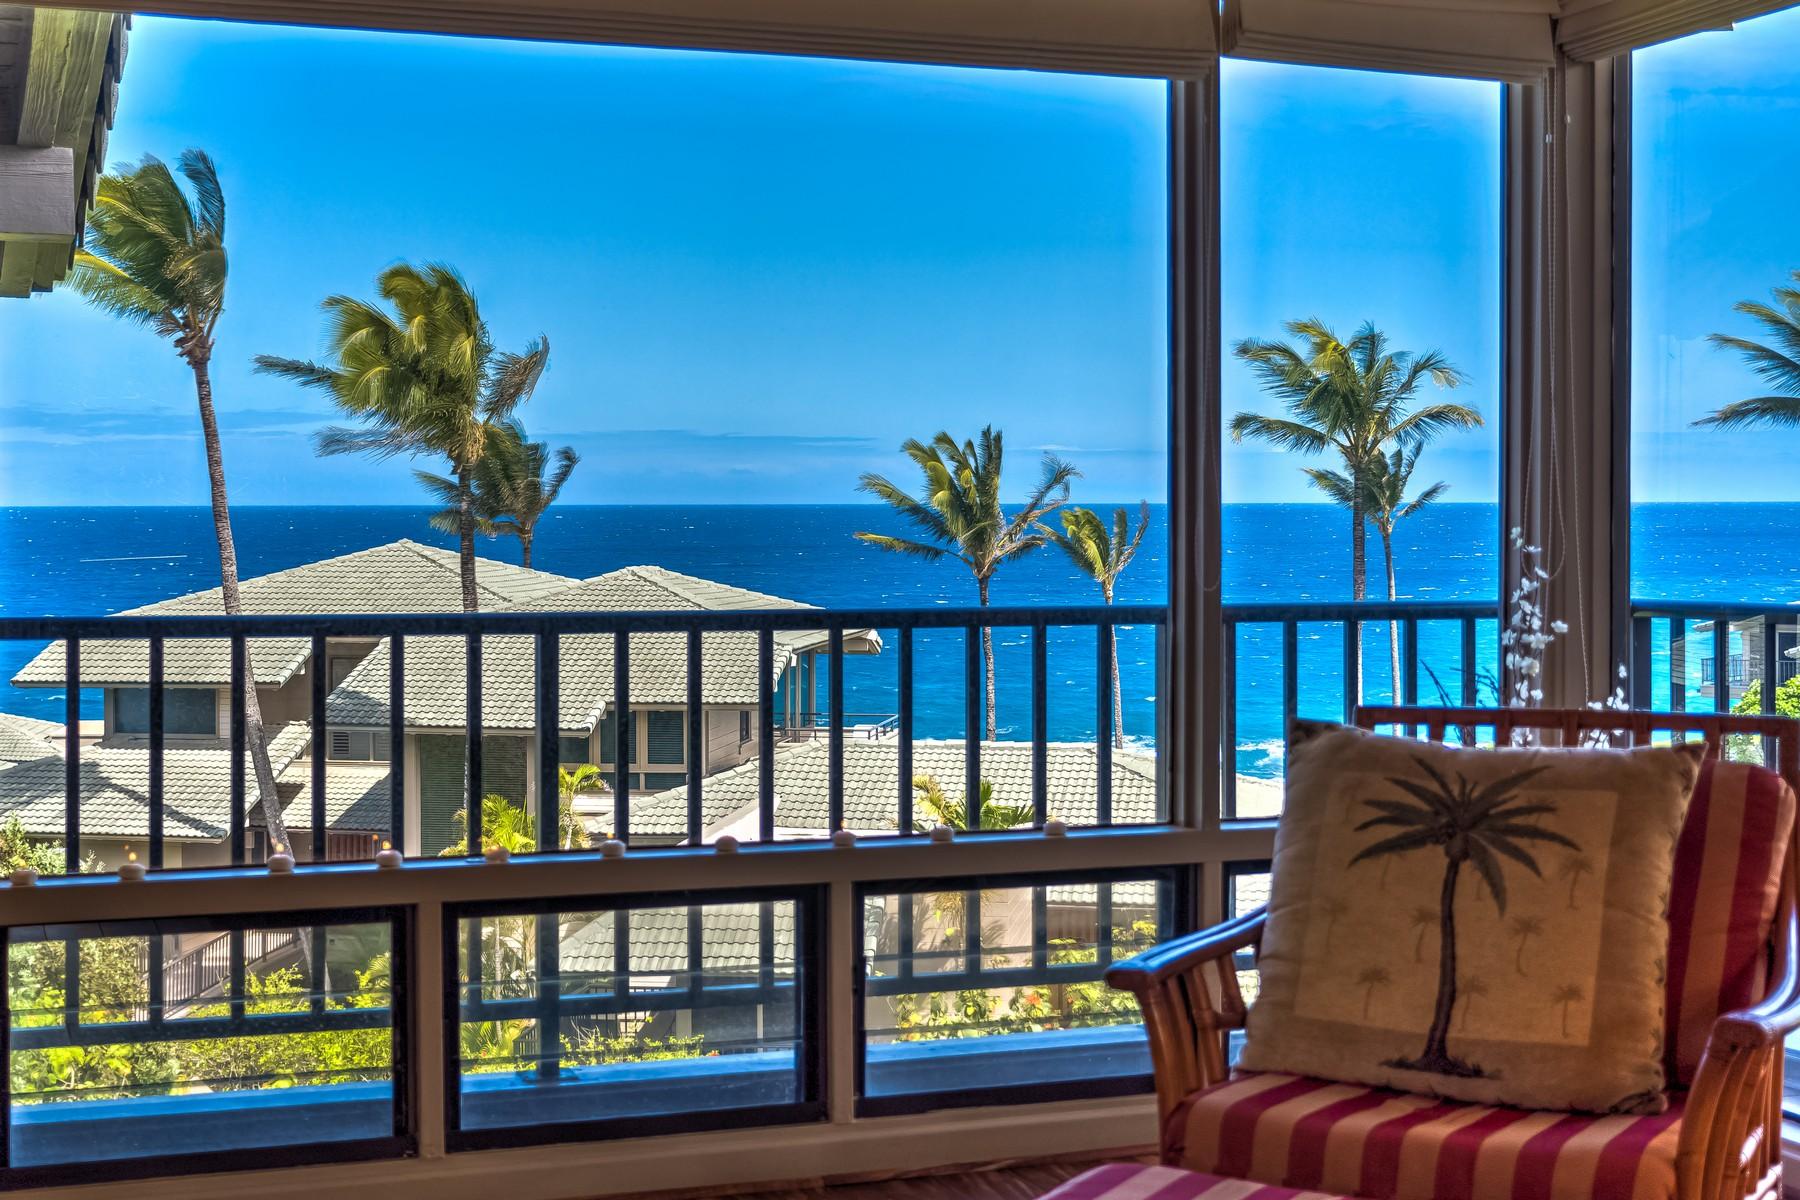 Condominium for Sale at Expansive Pacific Blue Ocean Views 500 Bay Drive, Kapalua Bay Villa 32B4 Kapalua, Hawaii, 96761 United States